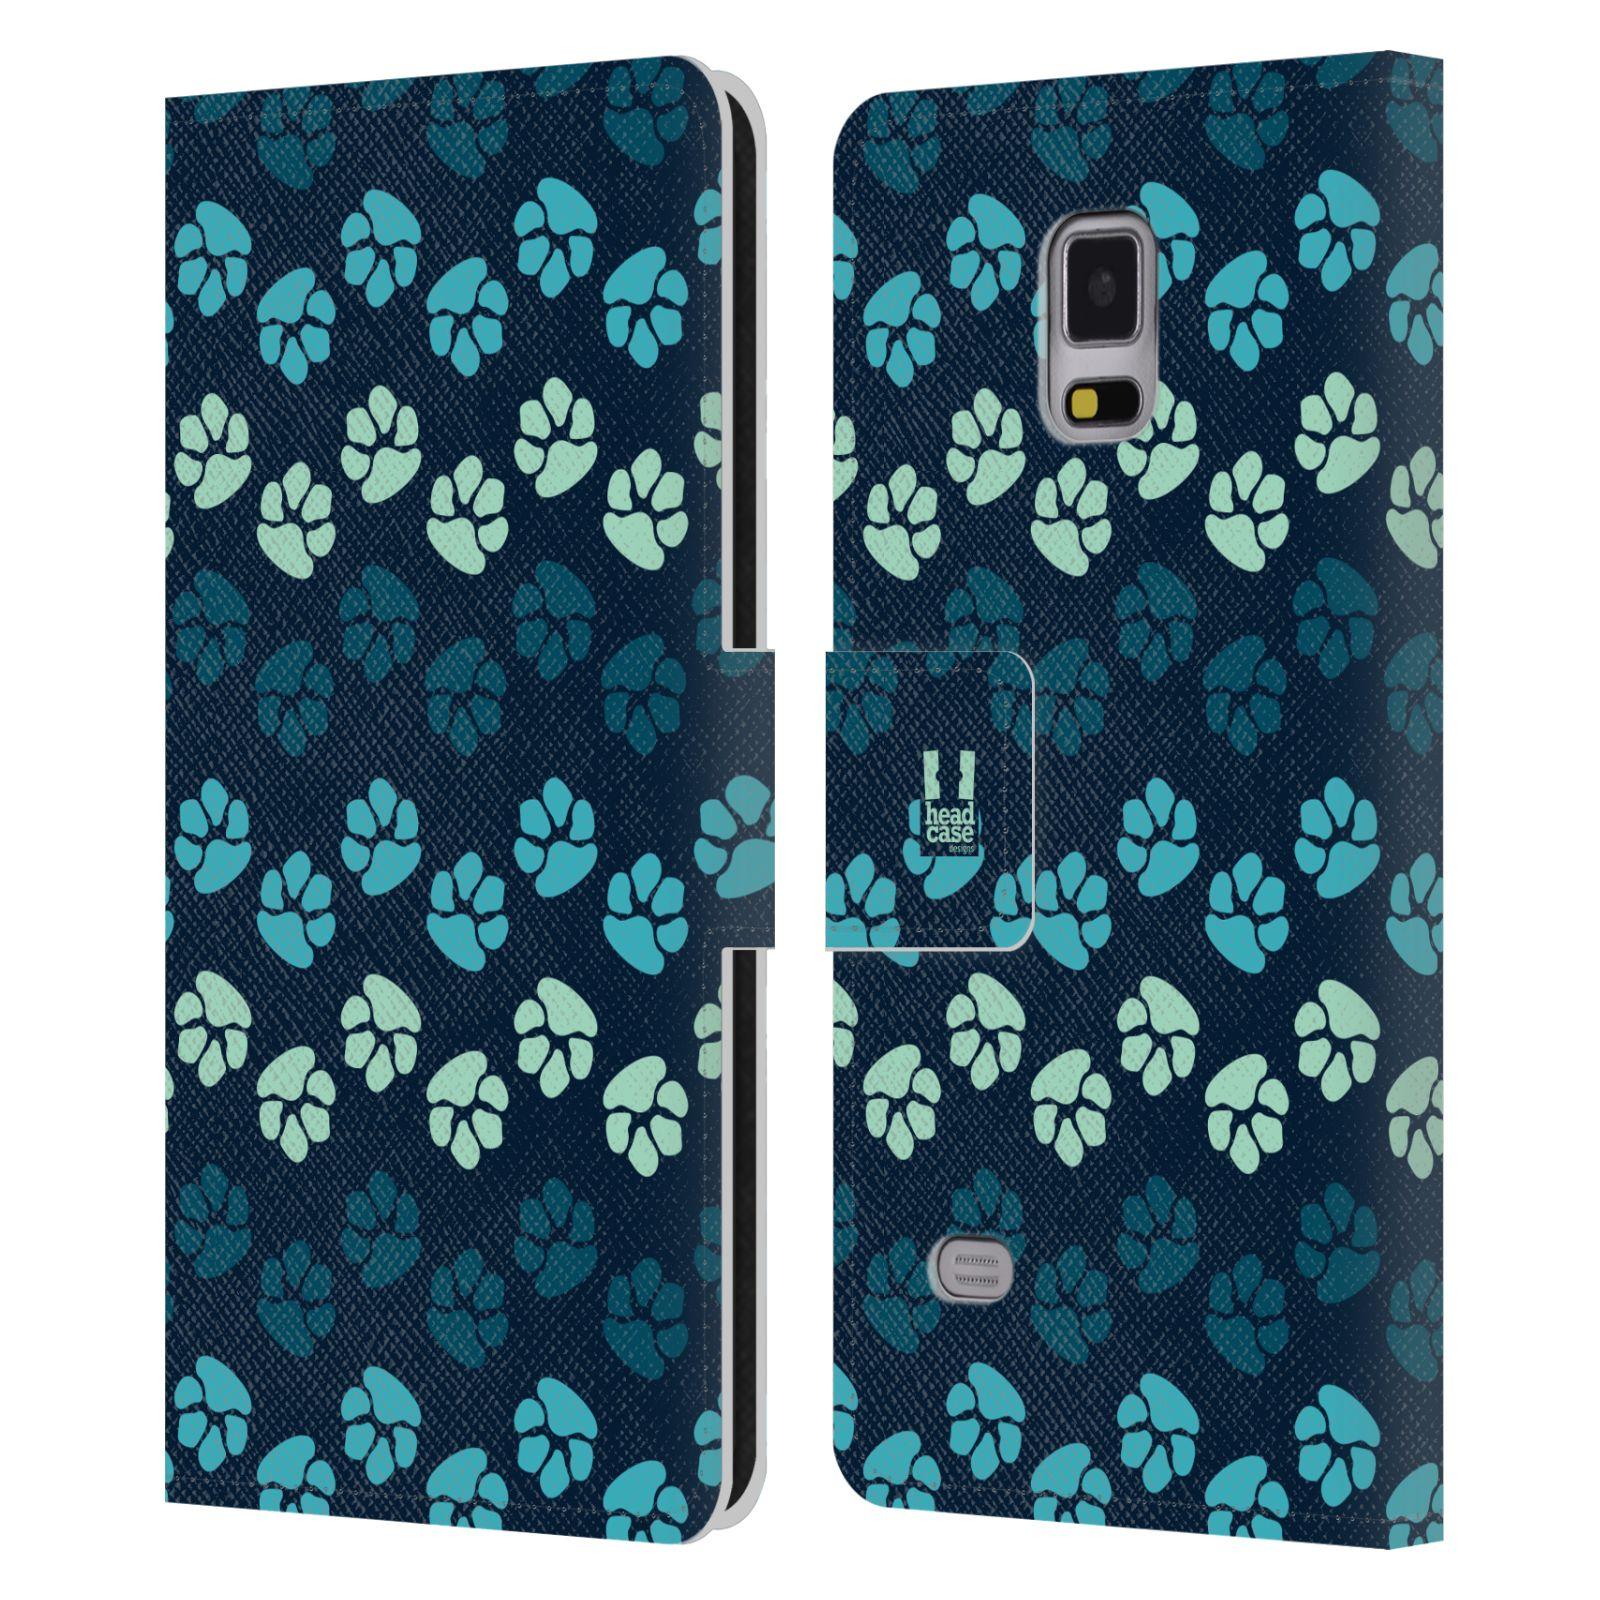 HEAD CASE Flipové pouzdro pro mobil Samsung Galaxy Note 4 Pejsek ťapky modrá barva